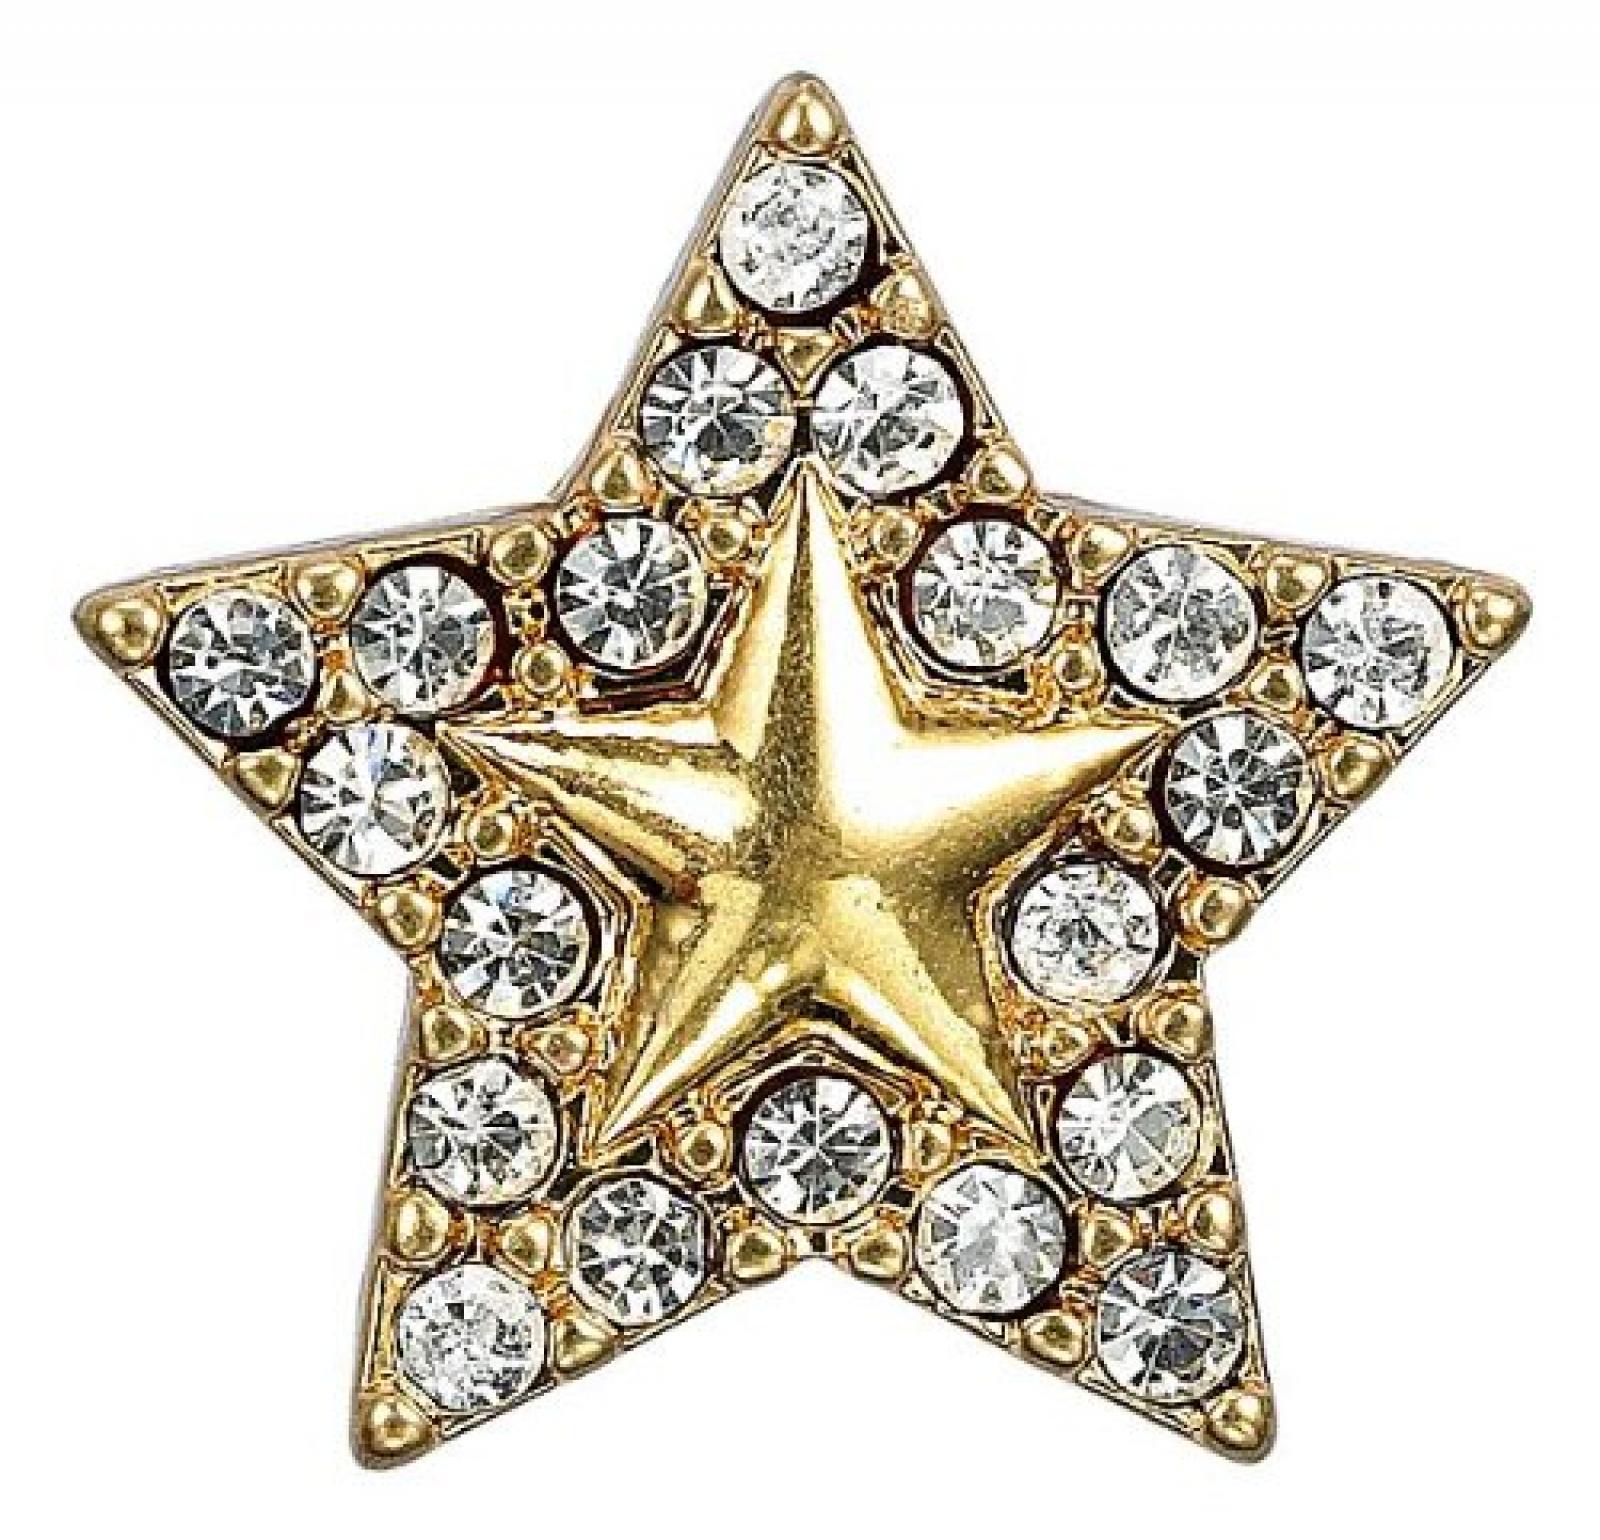 Pilgrim Damen-Anhänger Charming vergoldet kristall 42121-2044